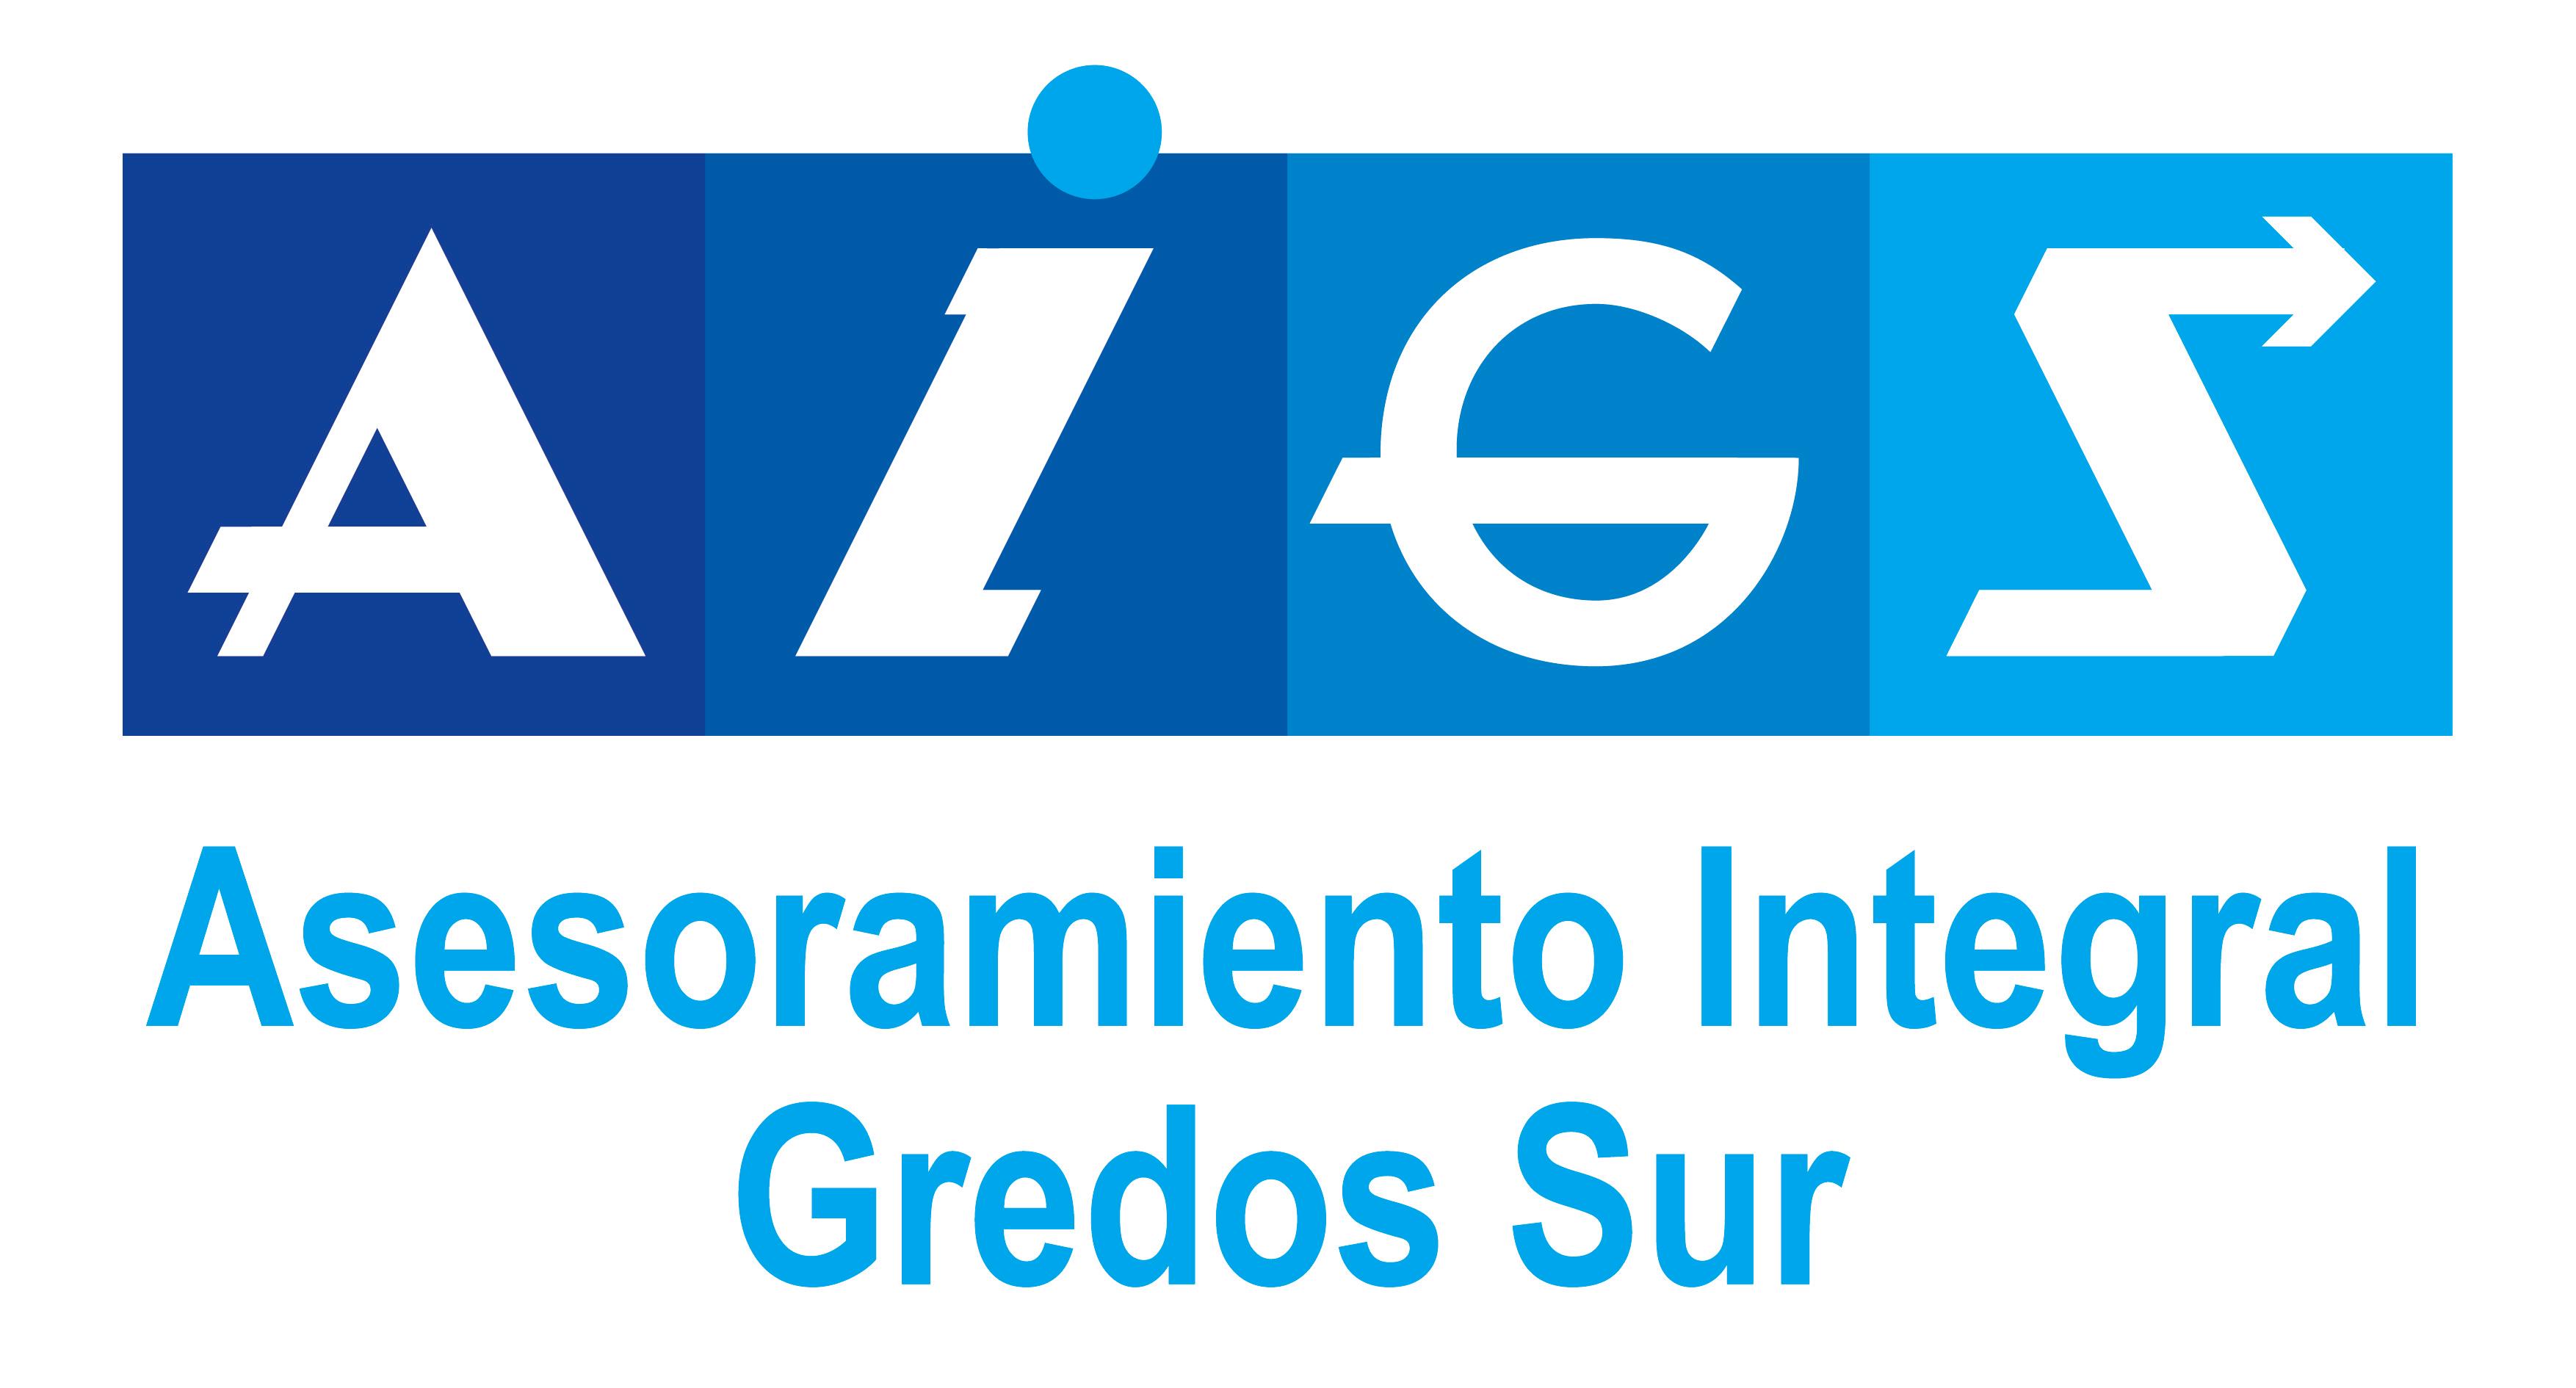 Asesoramiento Integral Gredos Sur - Arenas de San Pedro - TiétarTeVe.com